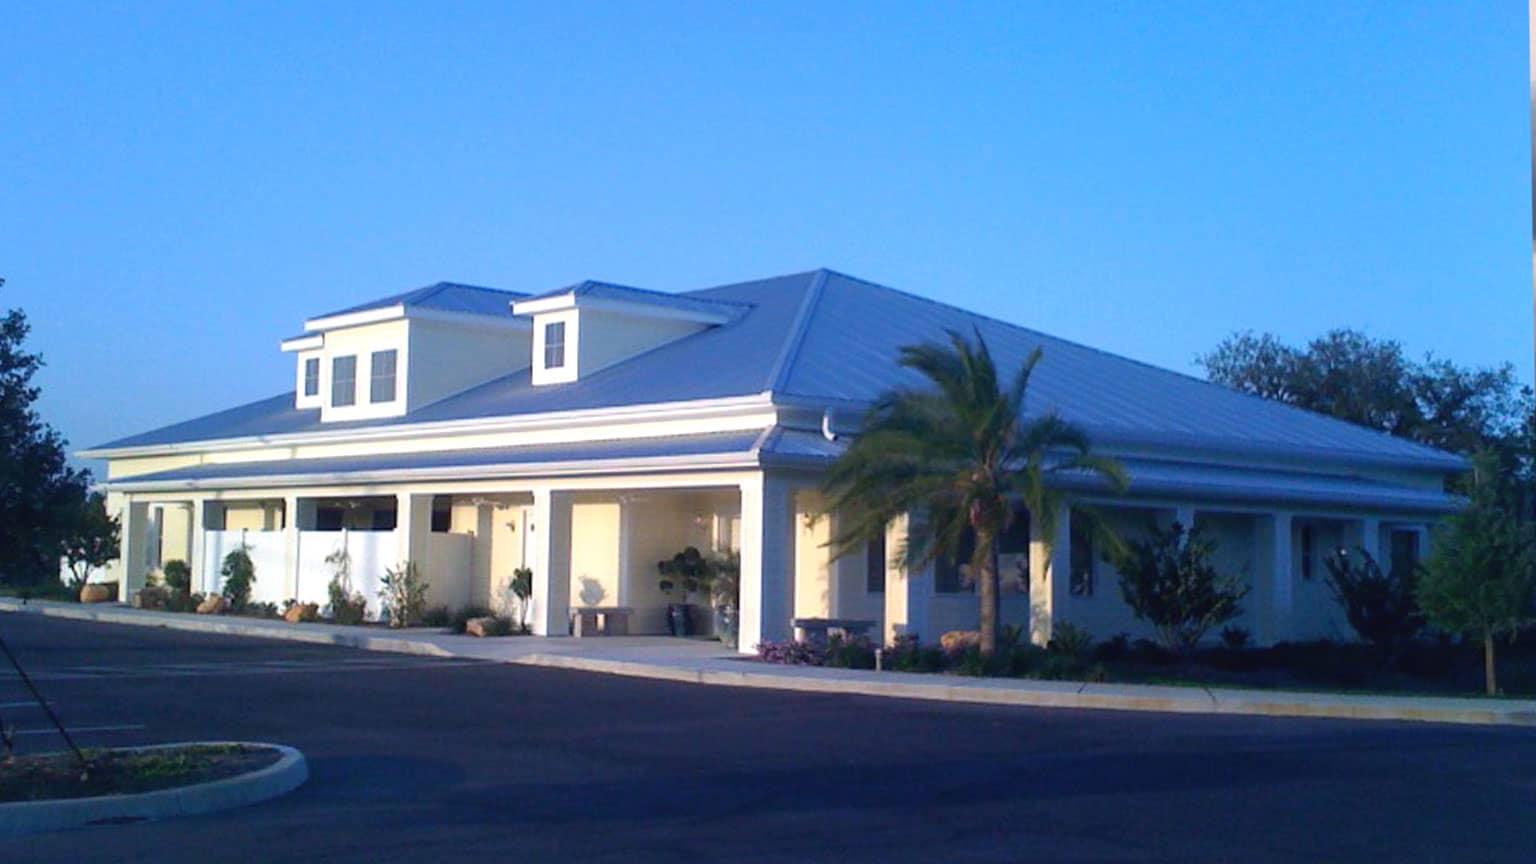 agnini-family-dental-lakeland-florida-agnini-building-1536x864-day